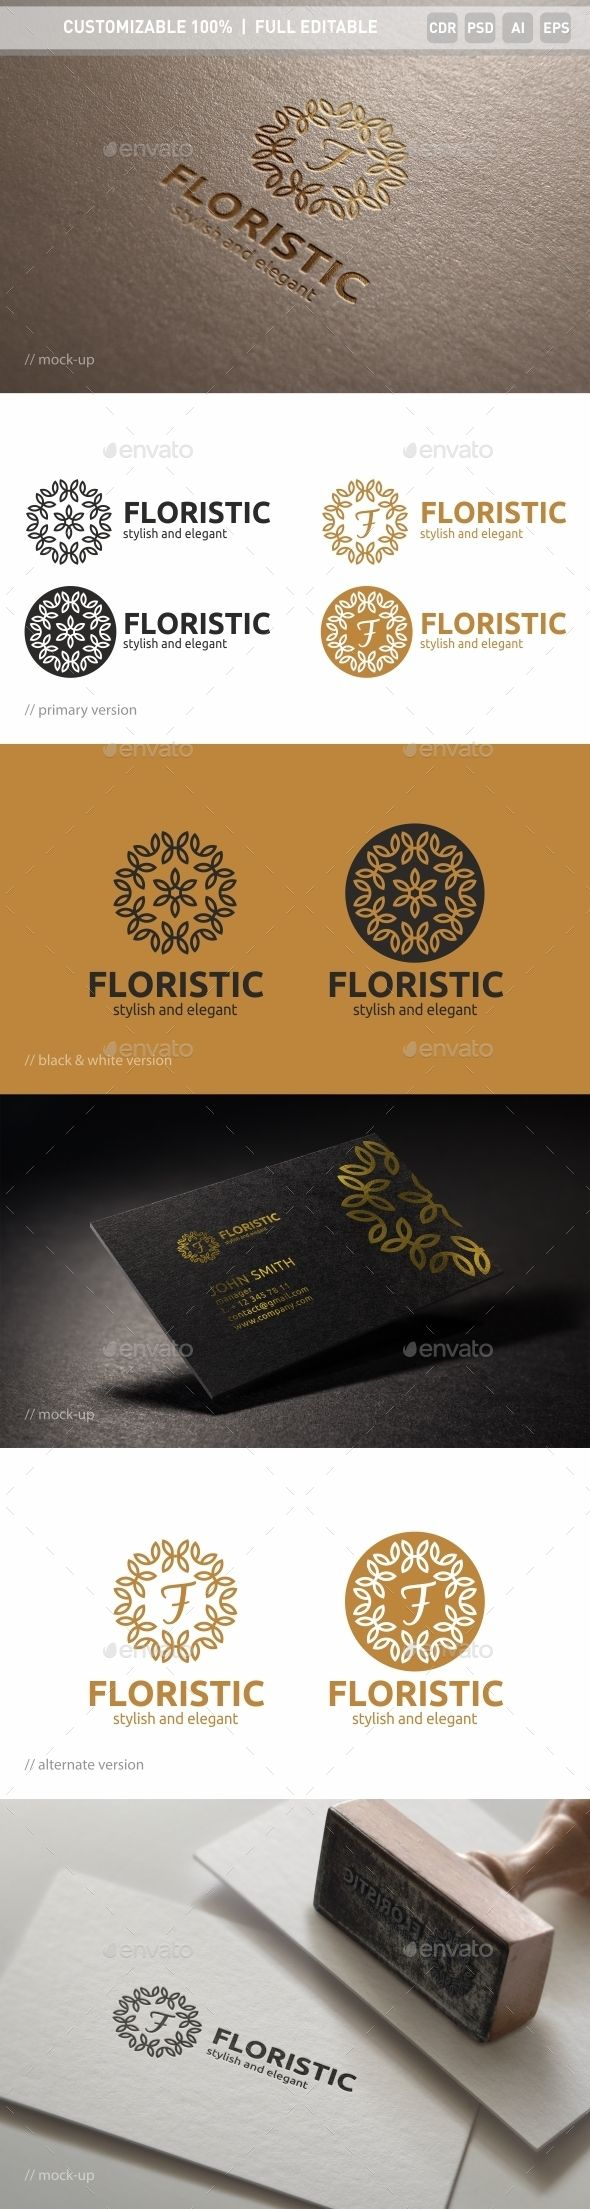 Floristic Logo Template #design #logotype Download: http://graphicriver.net/item/floristic-logo-template/13742191?ref=ksioks